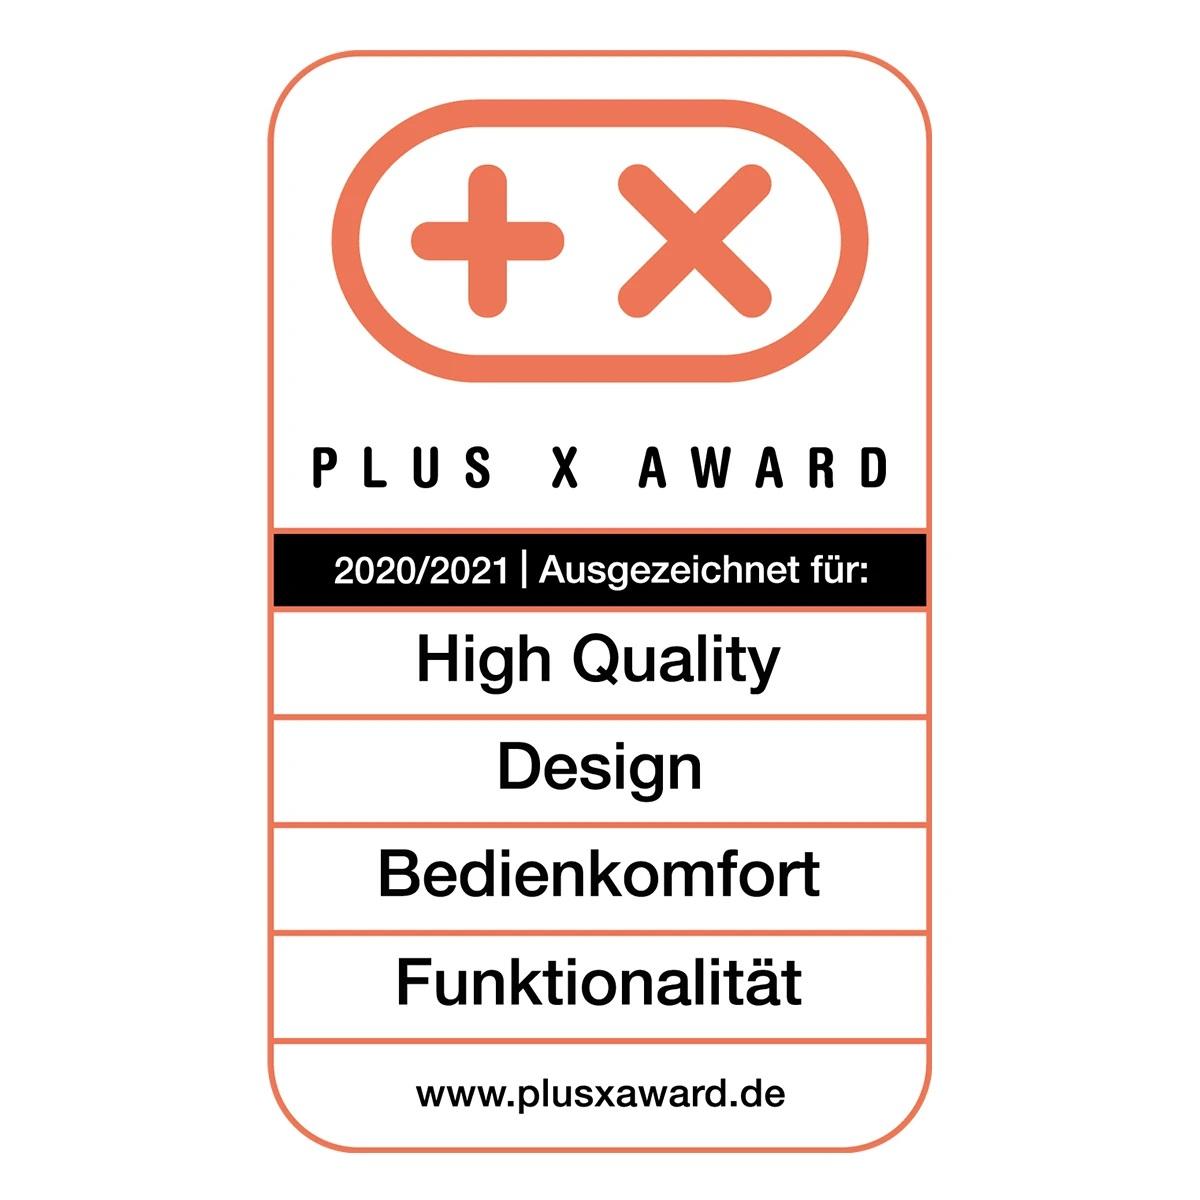 Plus X Award 2020/202